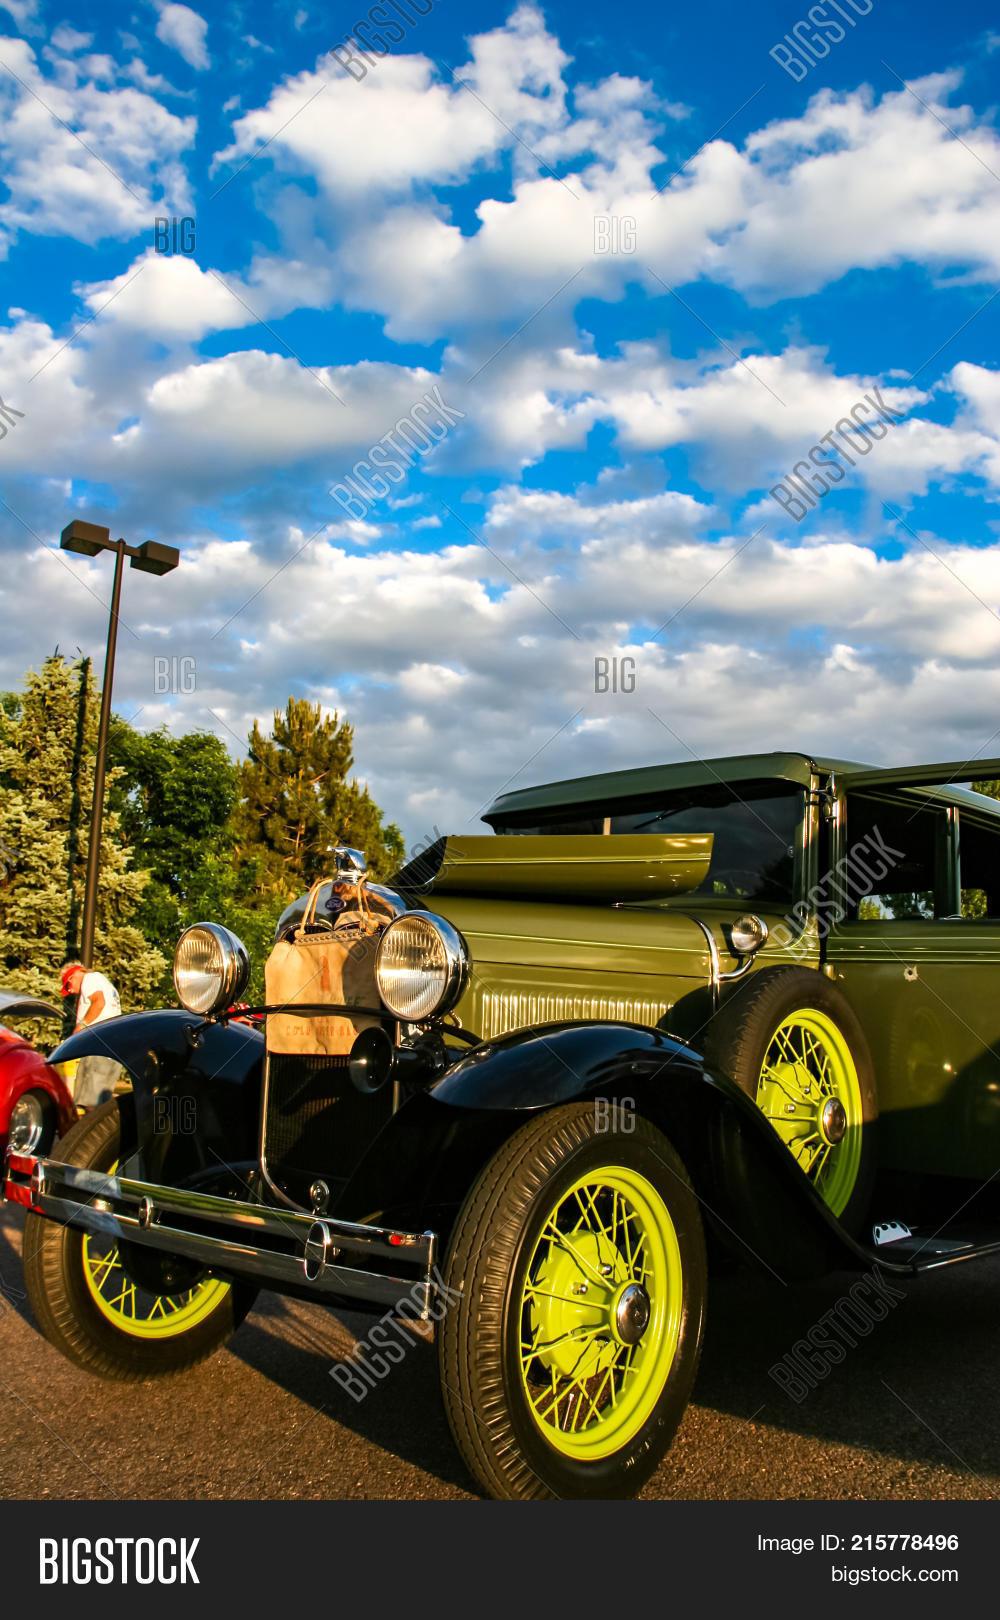 Burger King Classic Image Photo Free Trial Bigstock - Classic car show denver